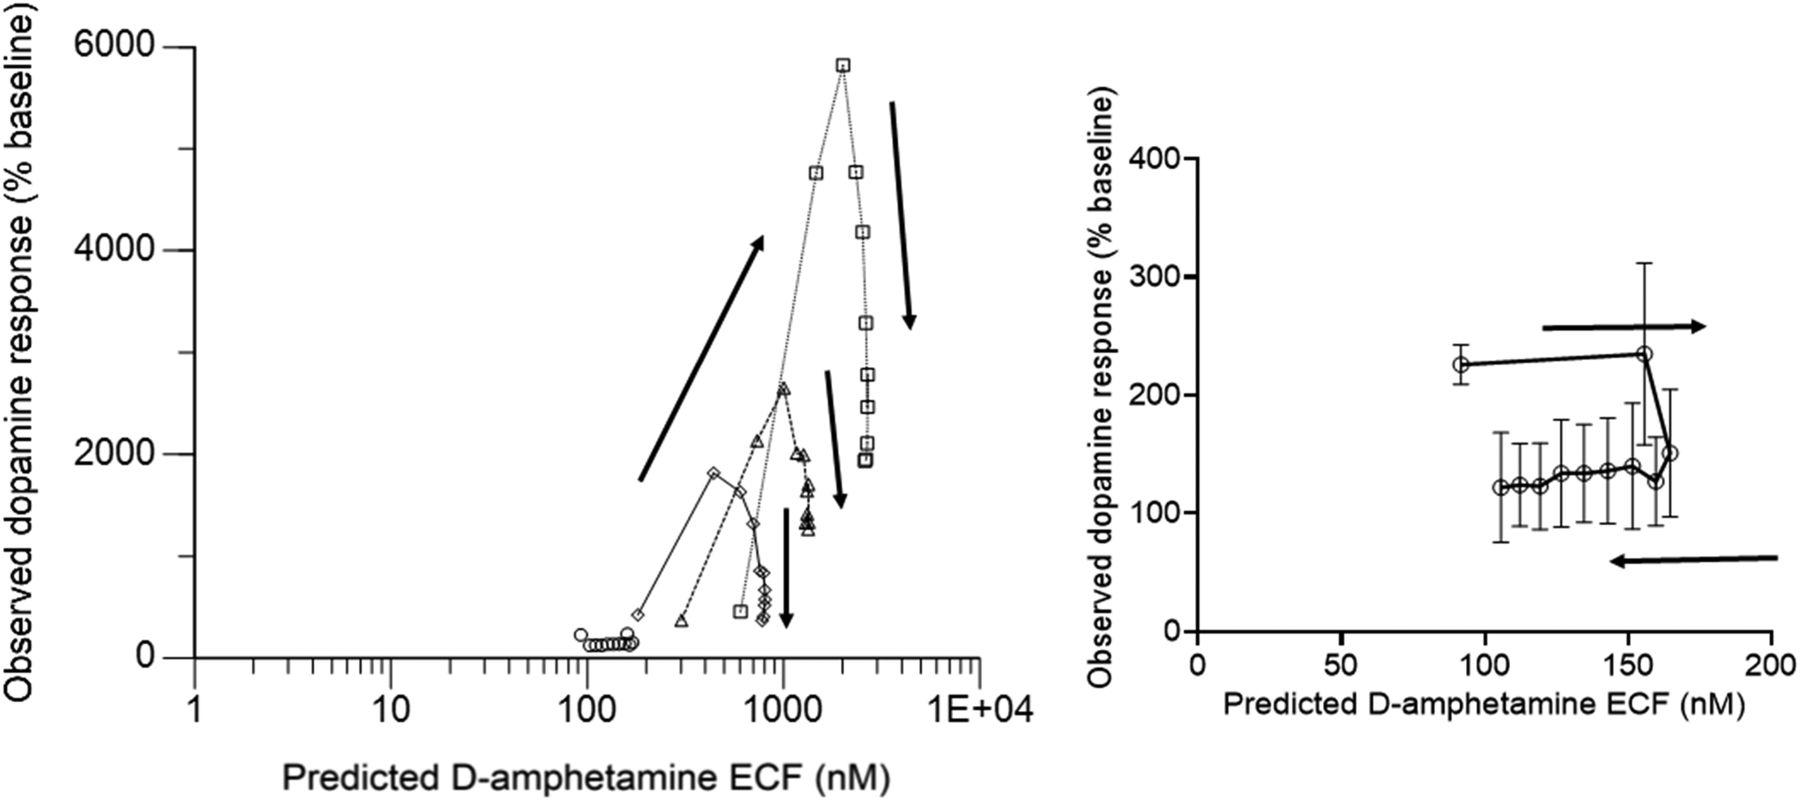 Development of a Semimechanistic Pharmacokinetic